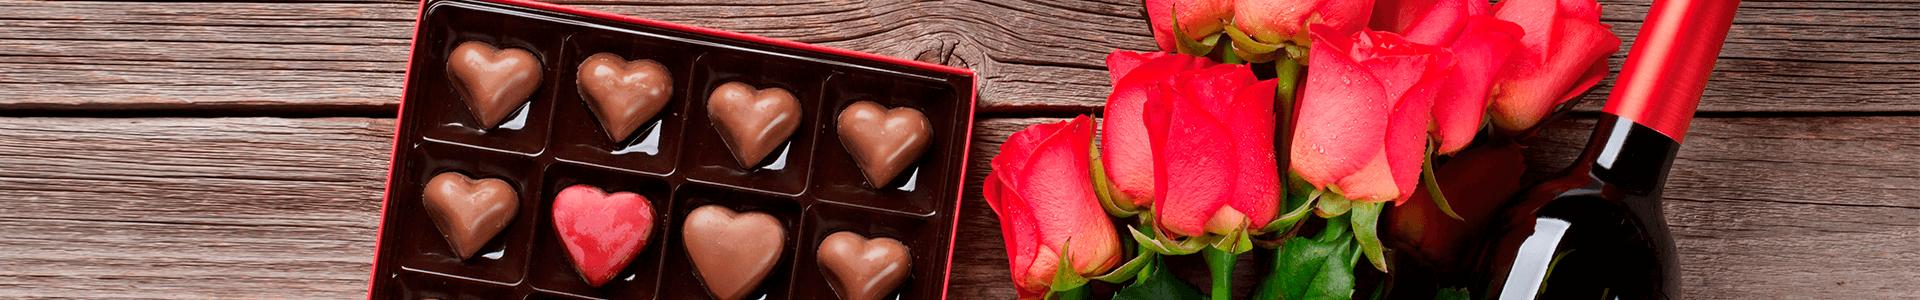 [DESKTOP] - Banner - Cestas - Chocolate